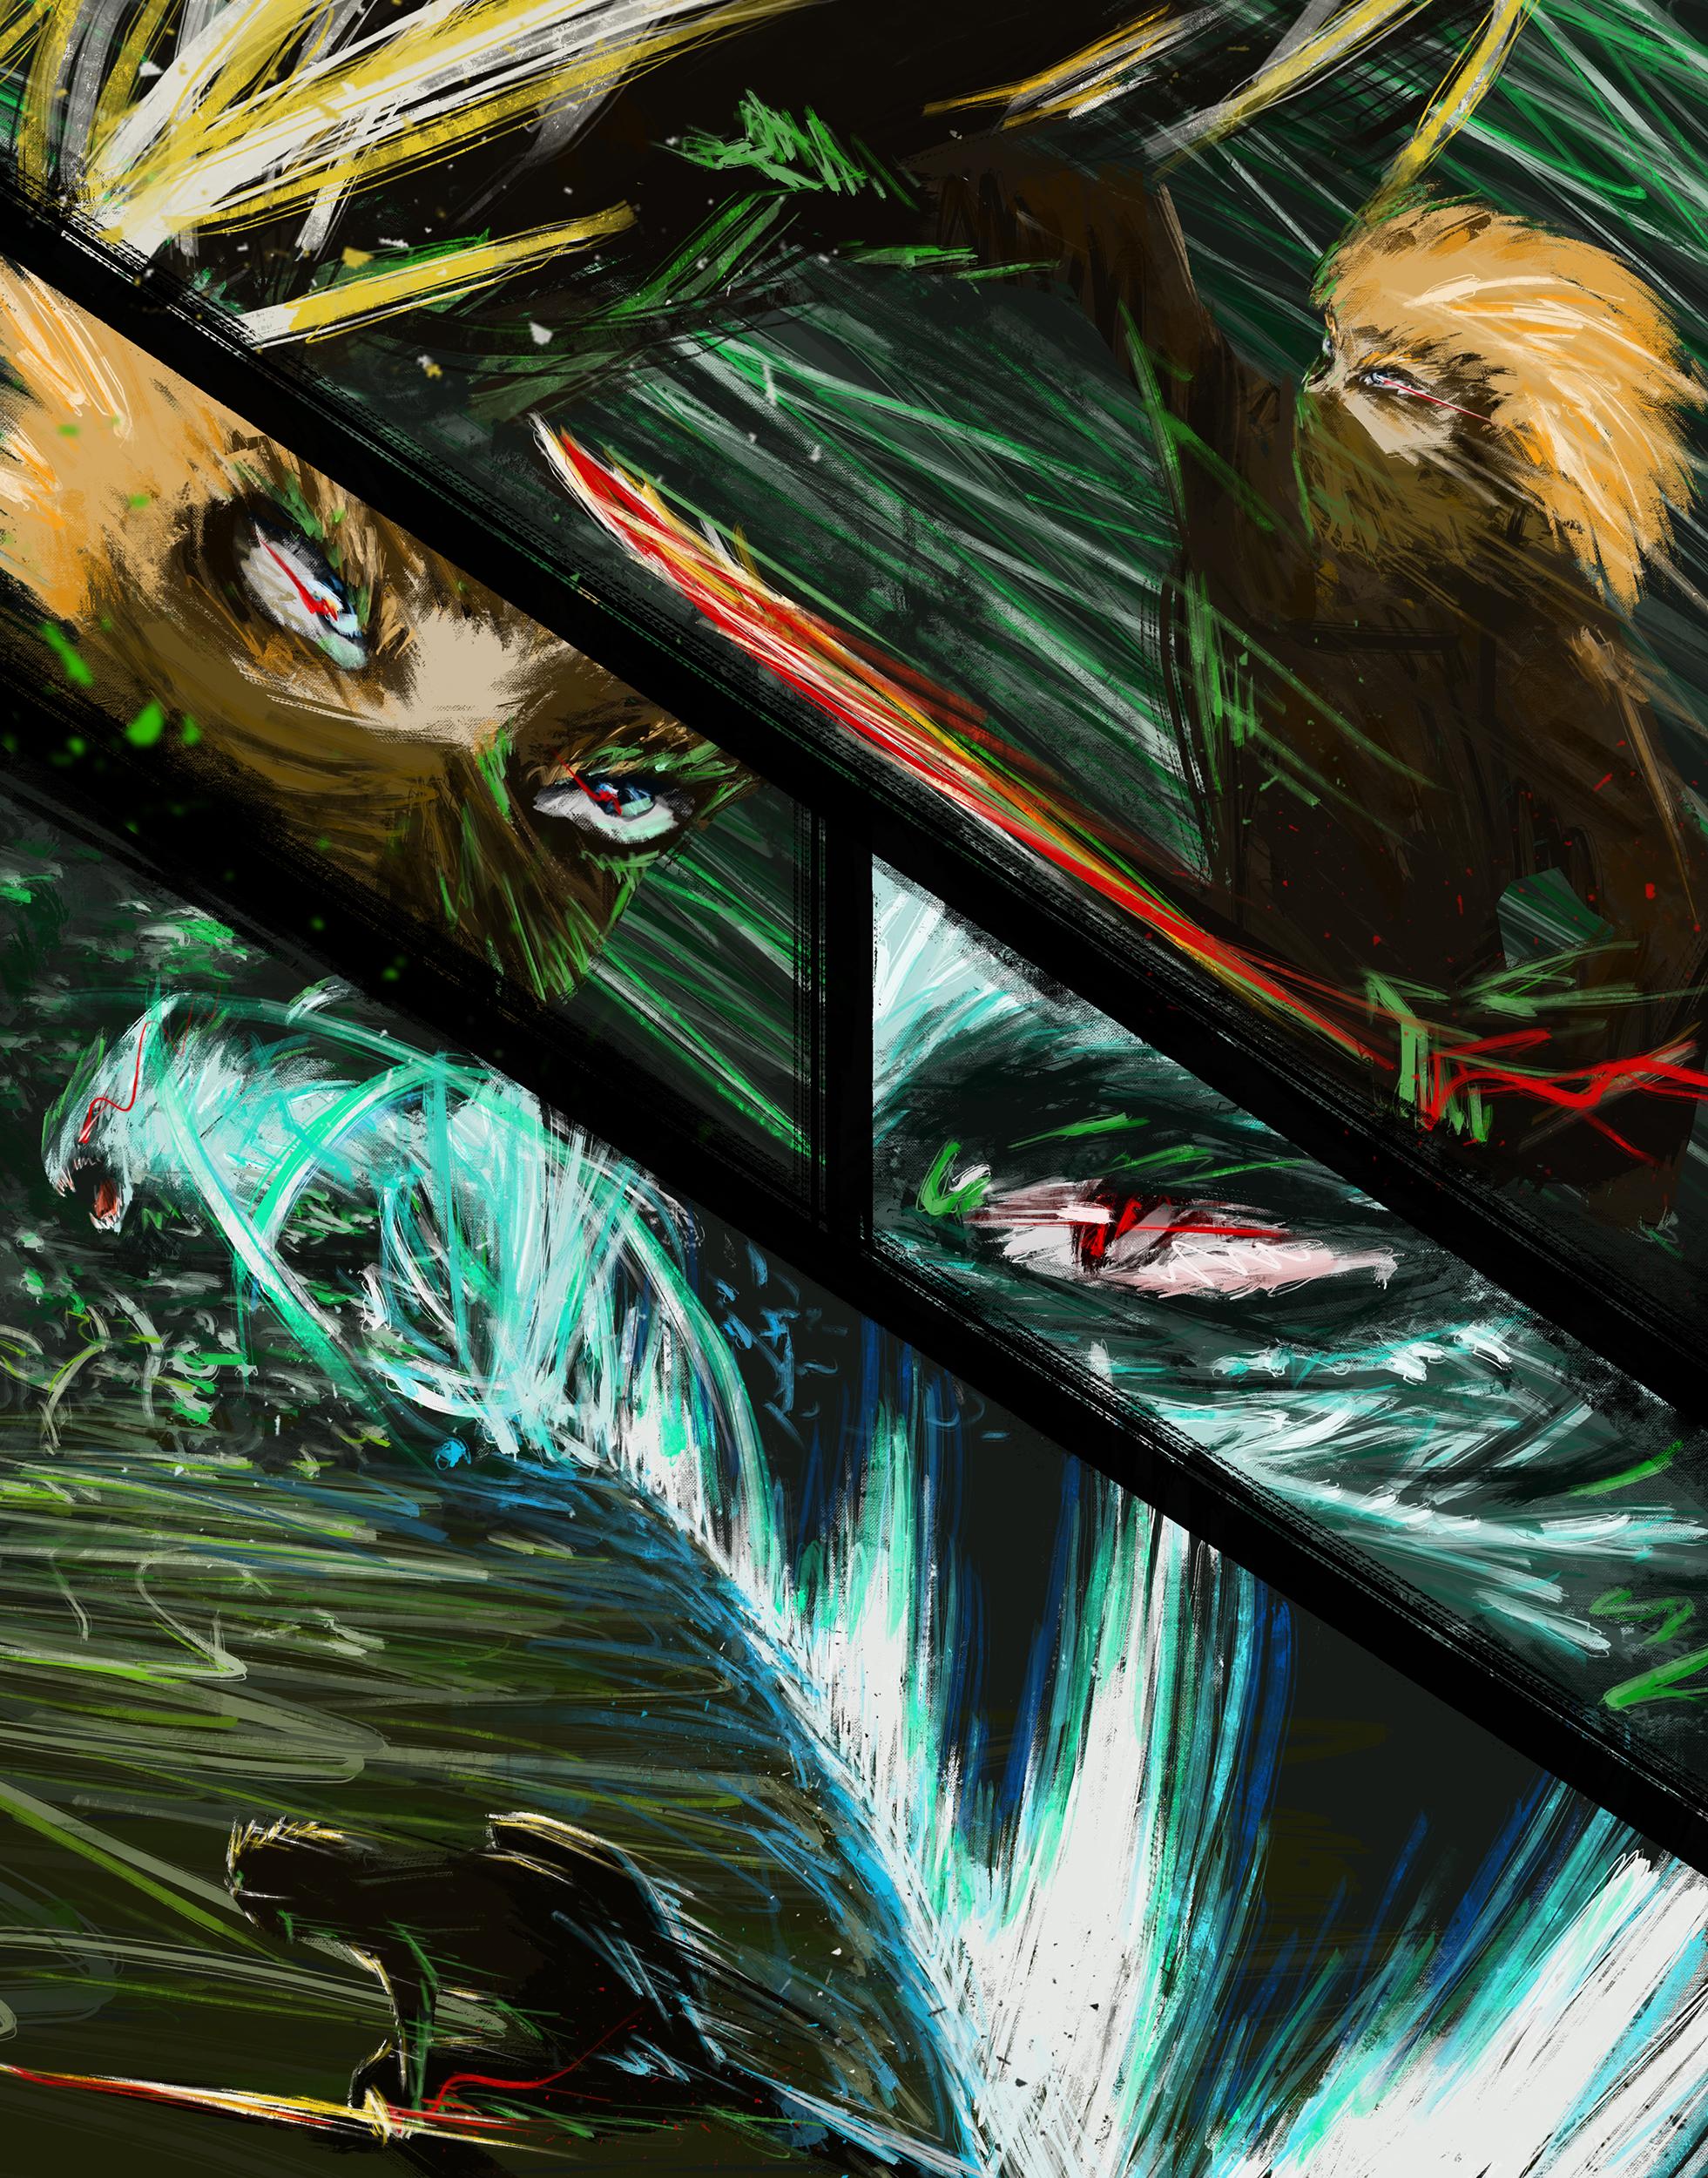 Fighting - 05 - The Pillar's Beast